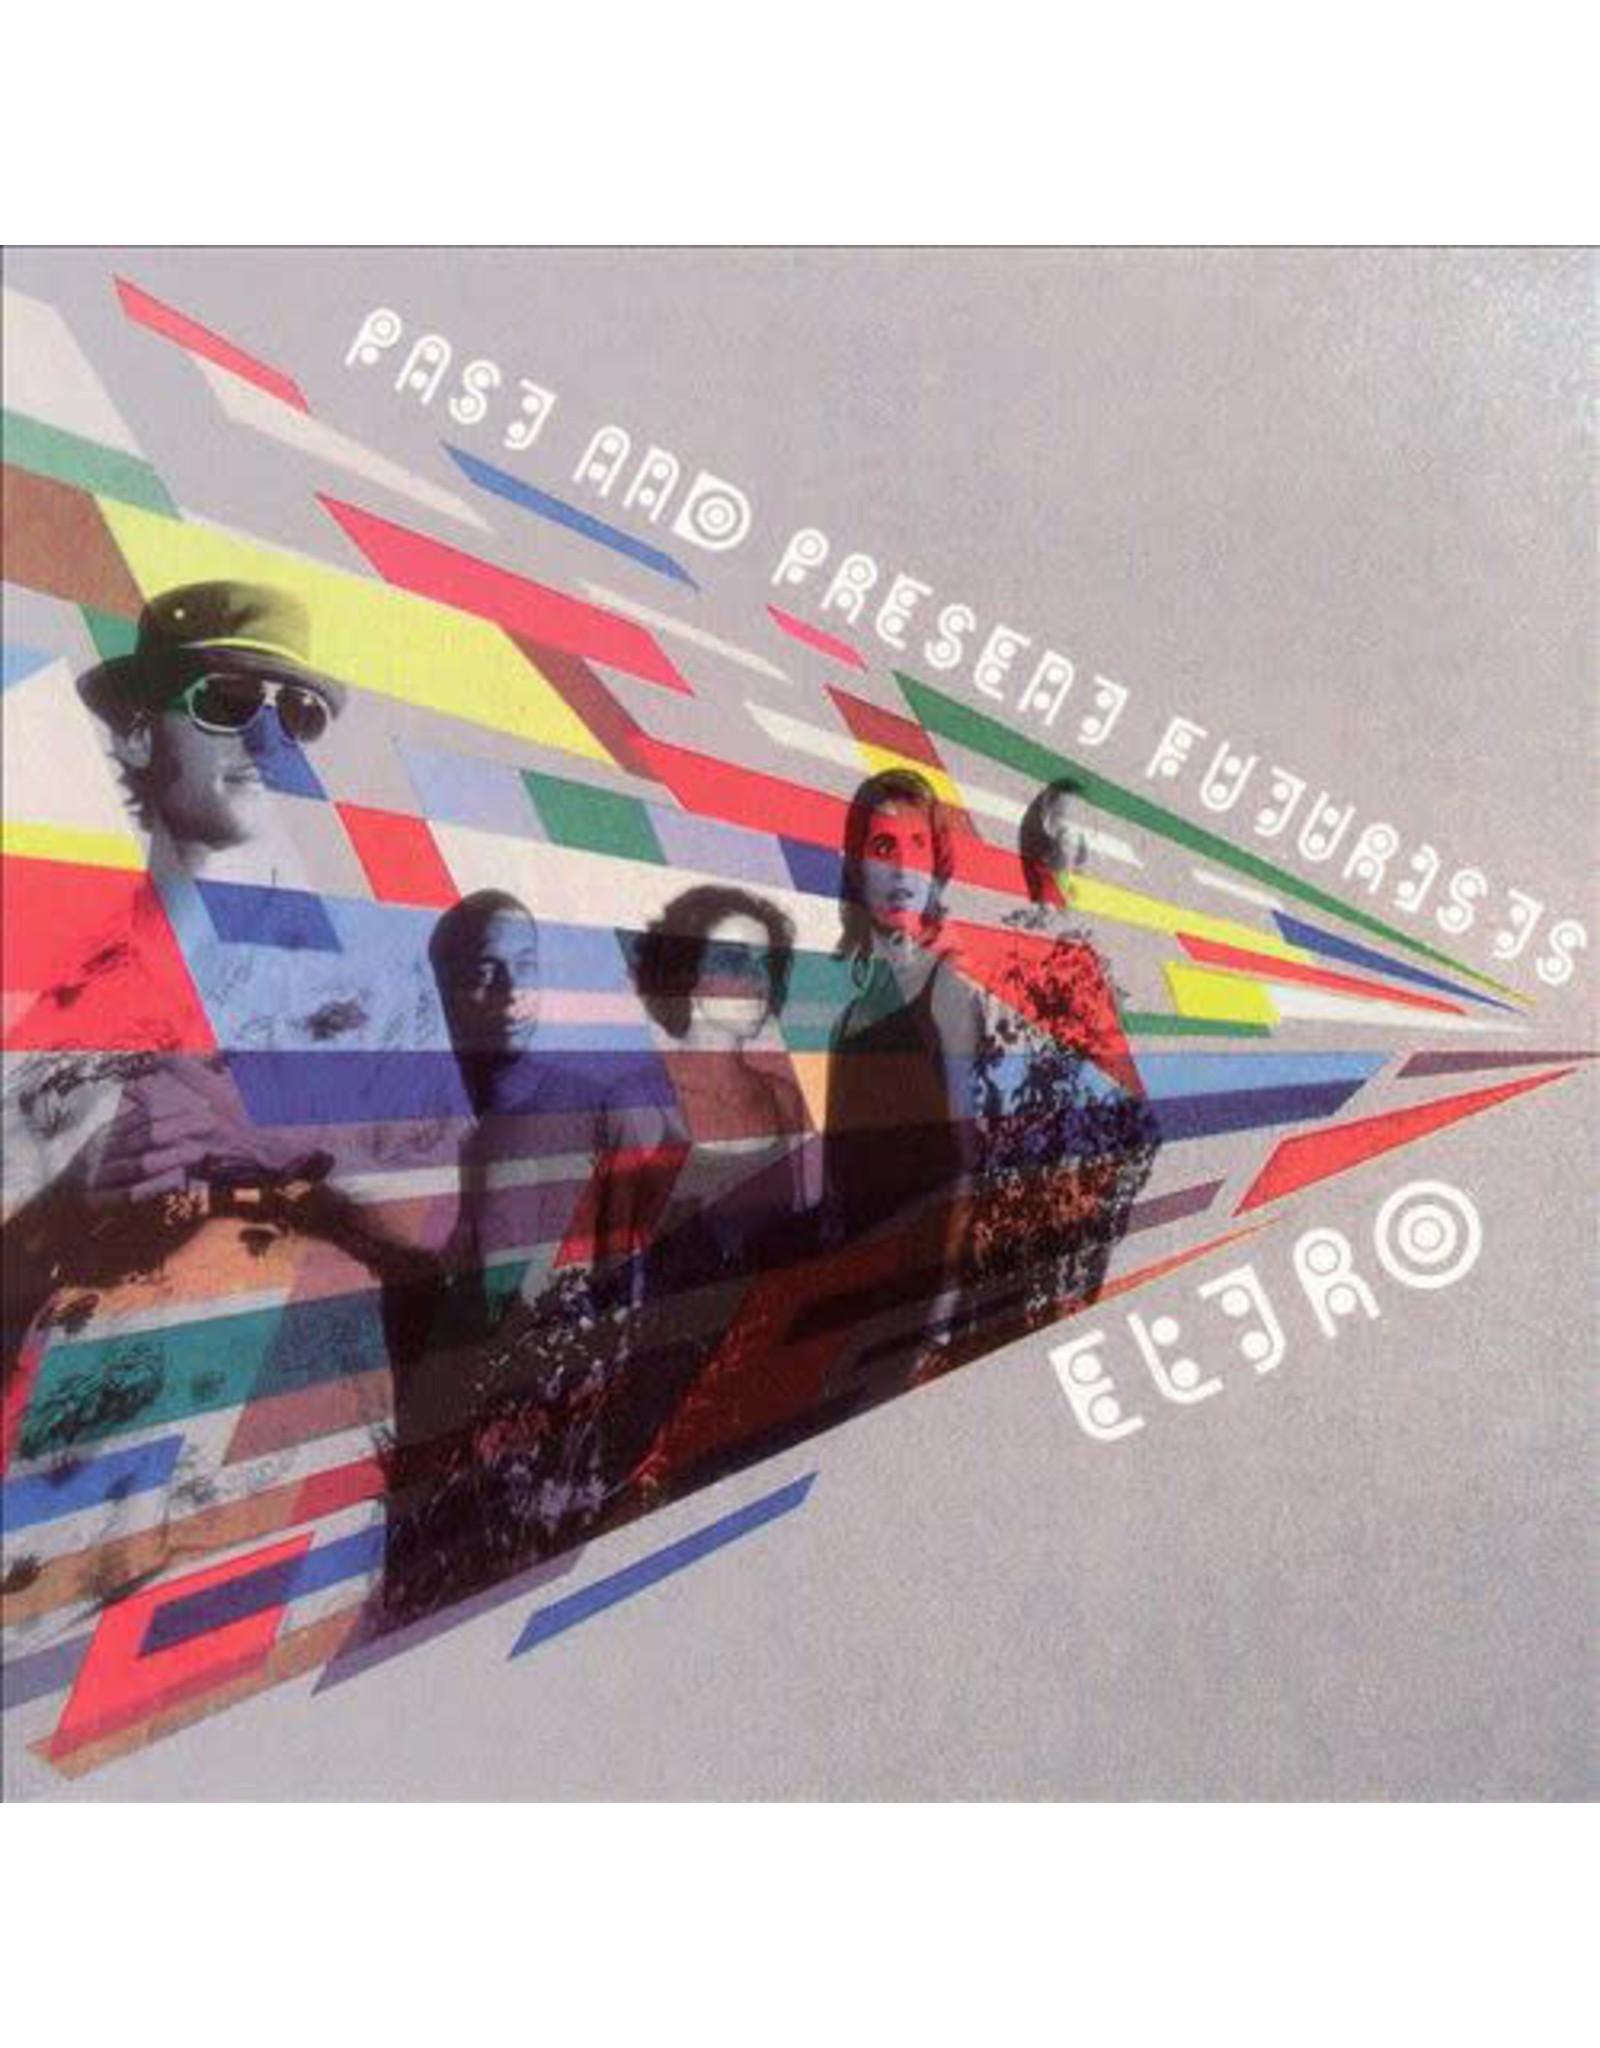 Eltro - Fast & Present Futurists CD